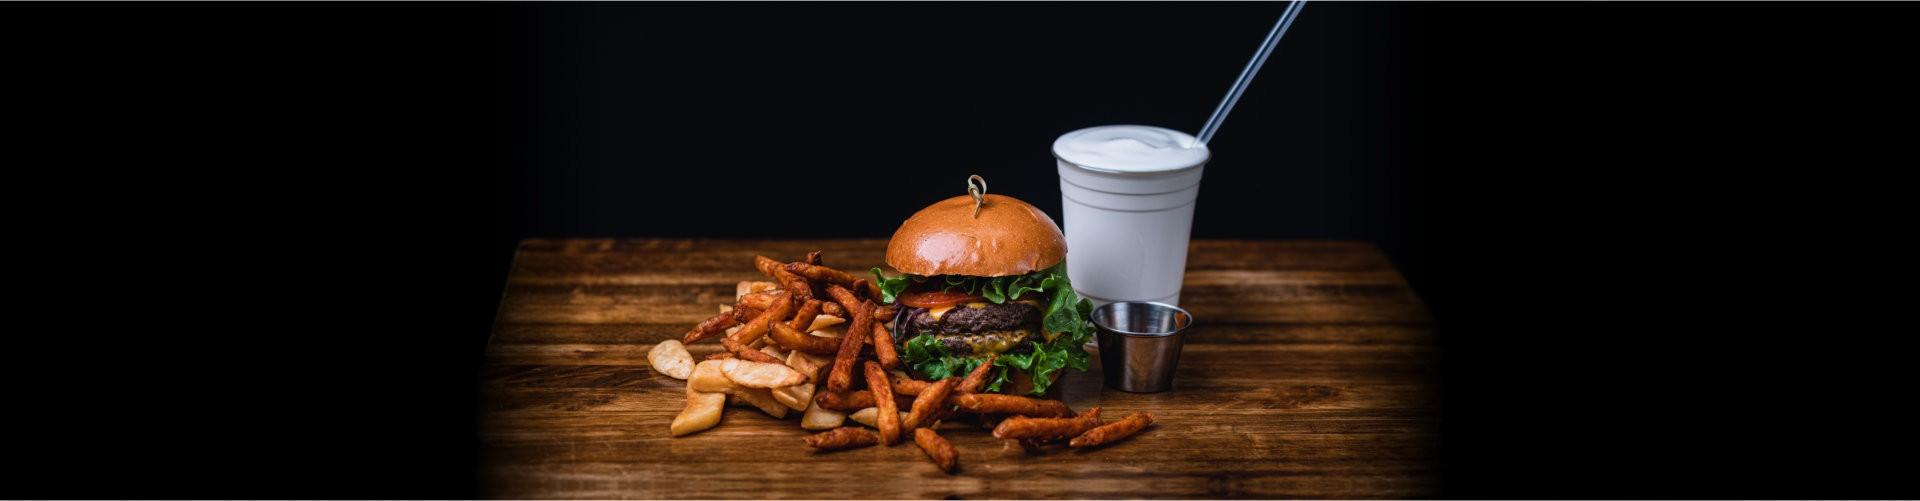 burger with shake